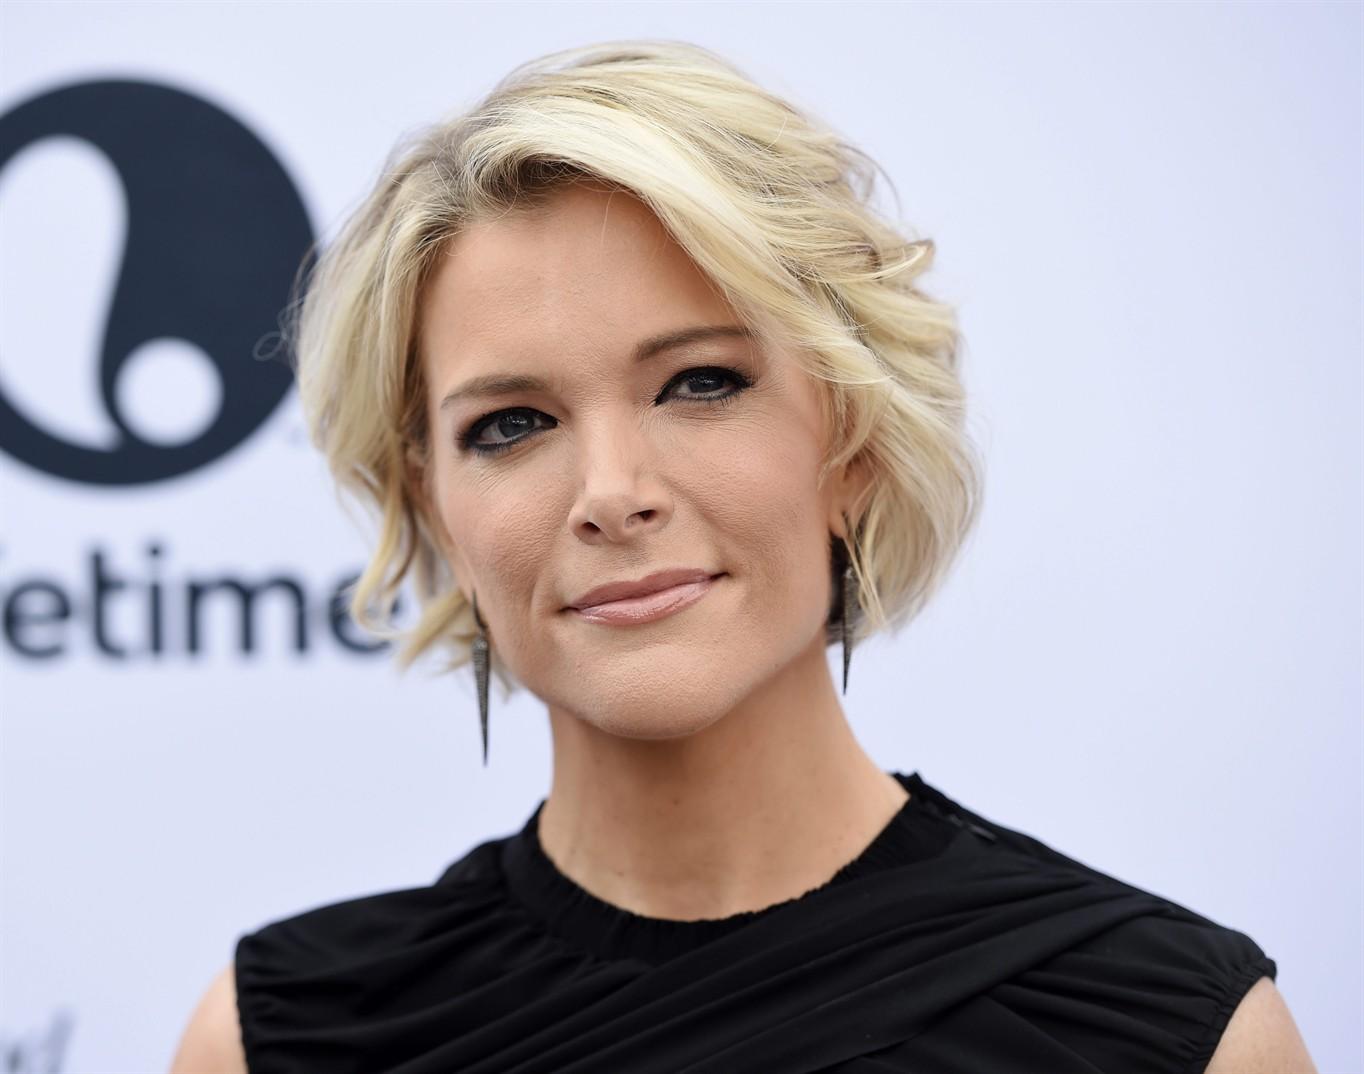 CNN chief: Alex Jones interview worthy, but NBC mishandled